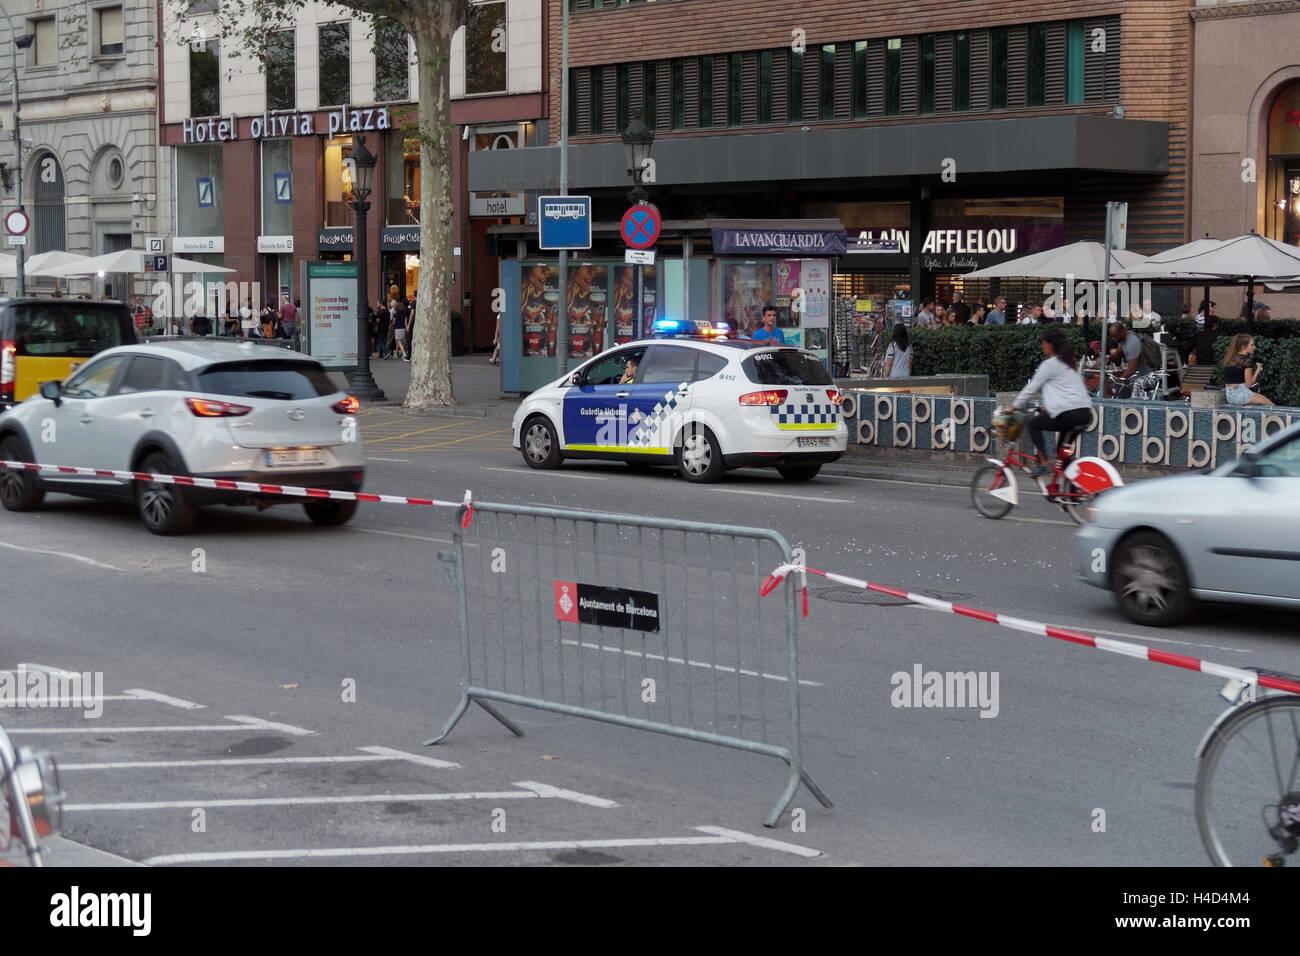 Guardia Urbana Policia, Municipal Police Barcelona, Spain. - Stock Image